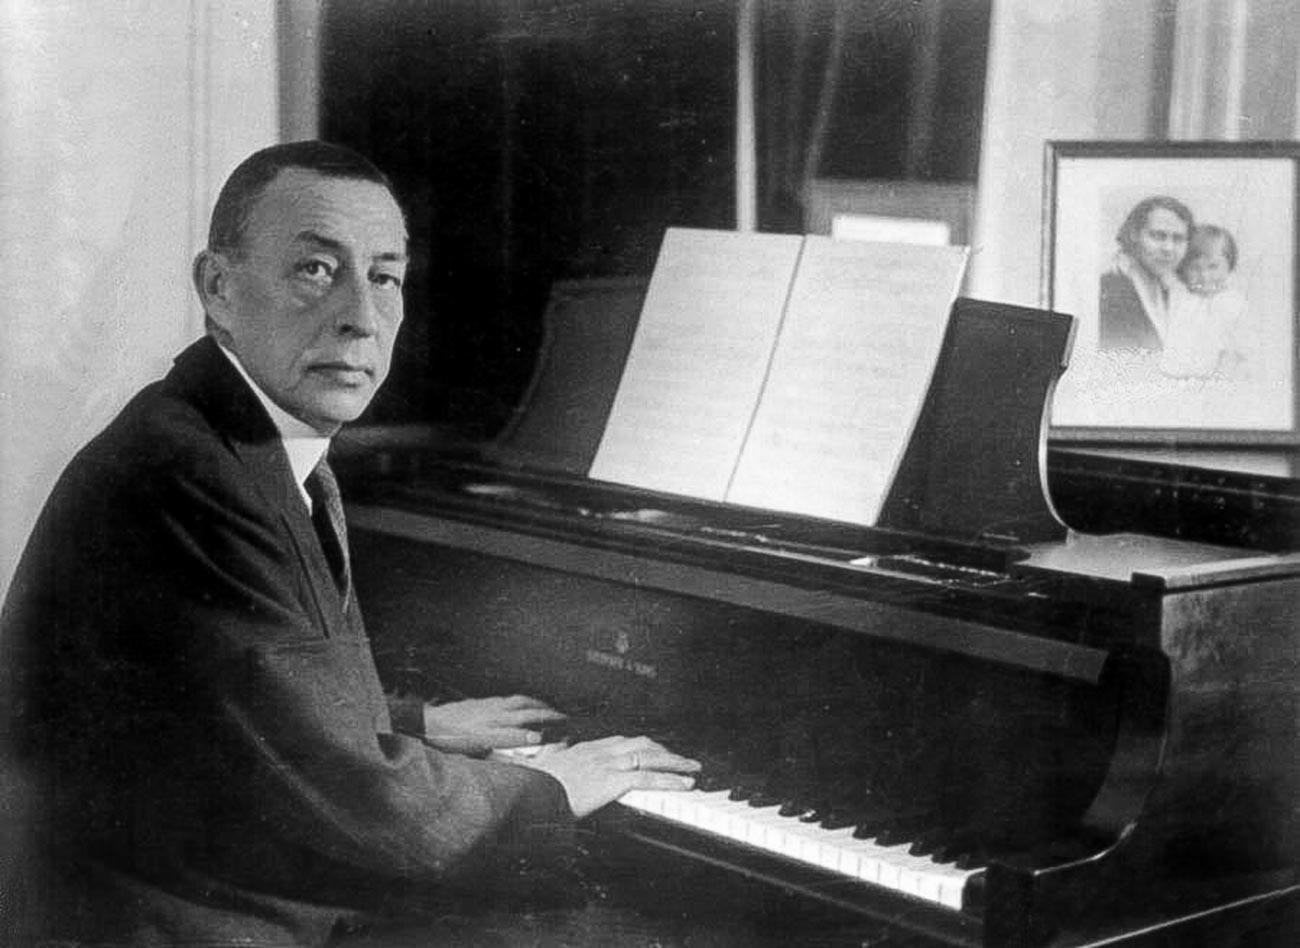 Сергеј Рахмањинов за Steinway клавиром.